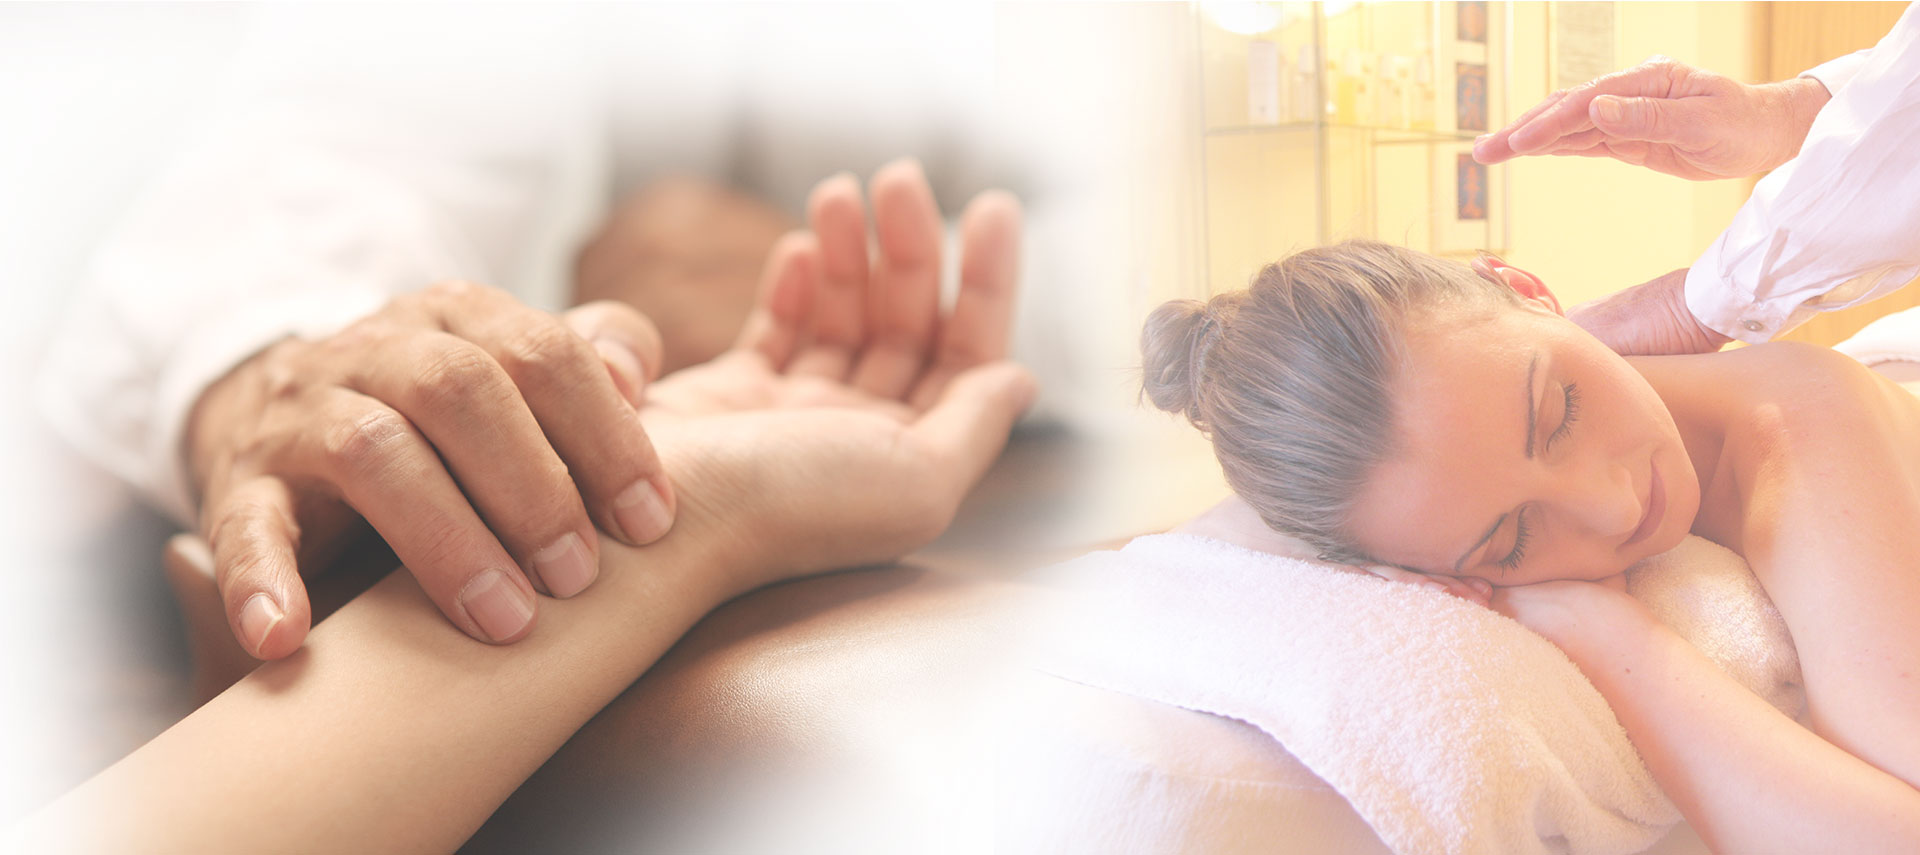 Mainslider - hand & massage